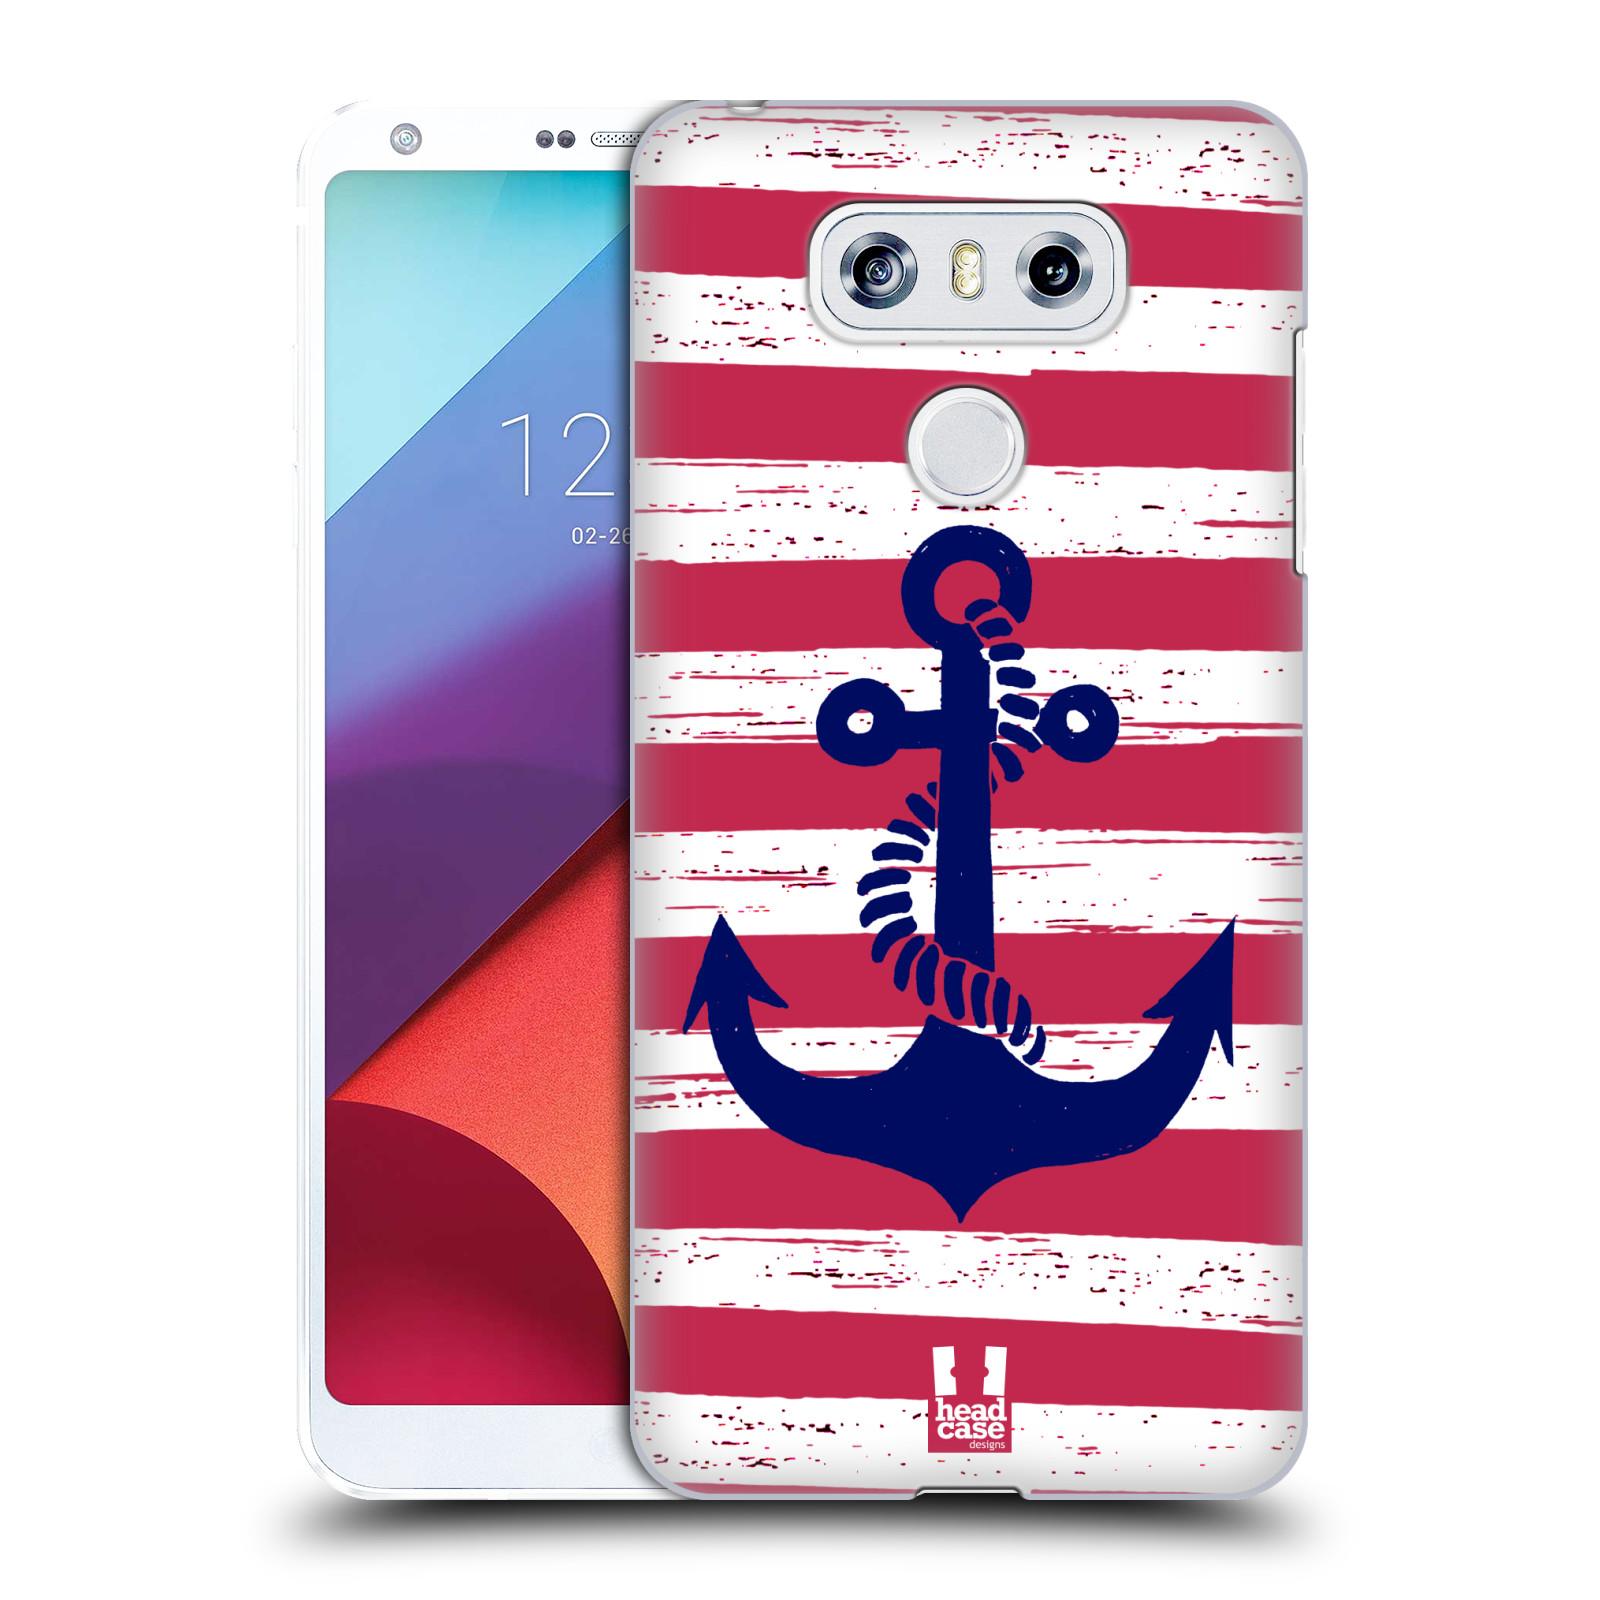 Plastové pouzdro na mobil LG G6 - Head Case KOTVA S PRUHY